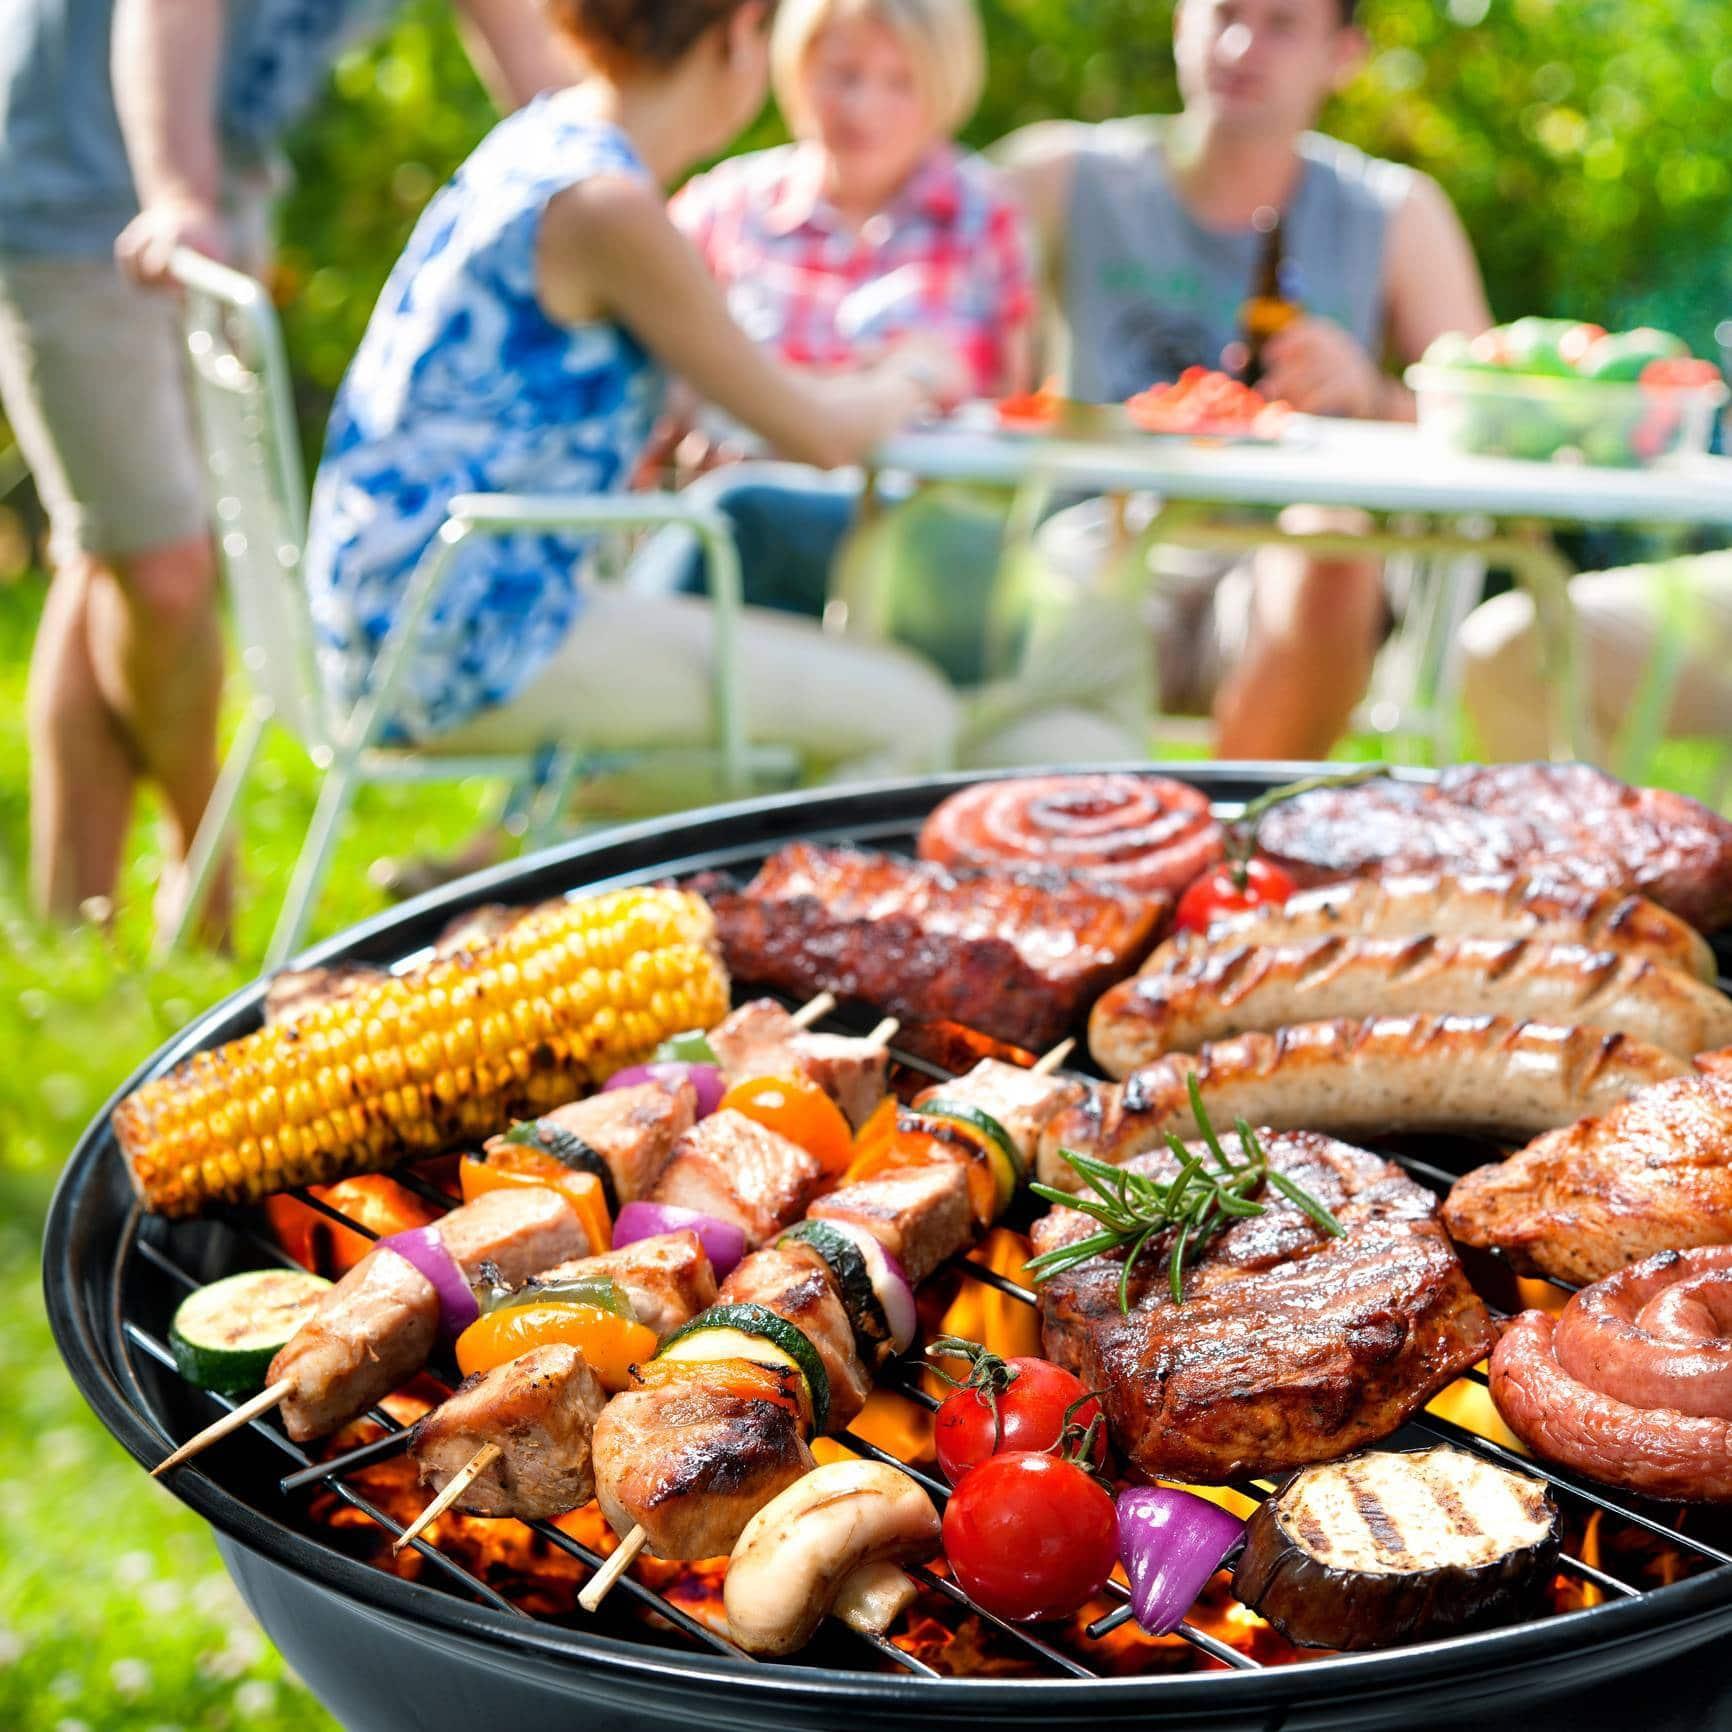 visu organiser familial barbecue un - Comment organiser un barbecue familial ?